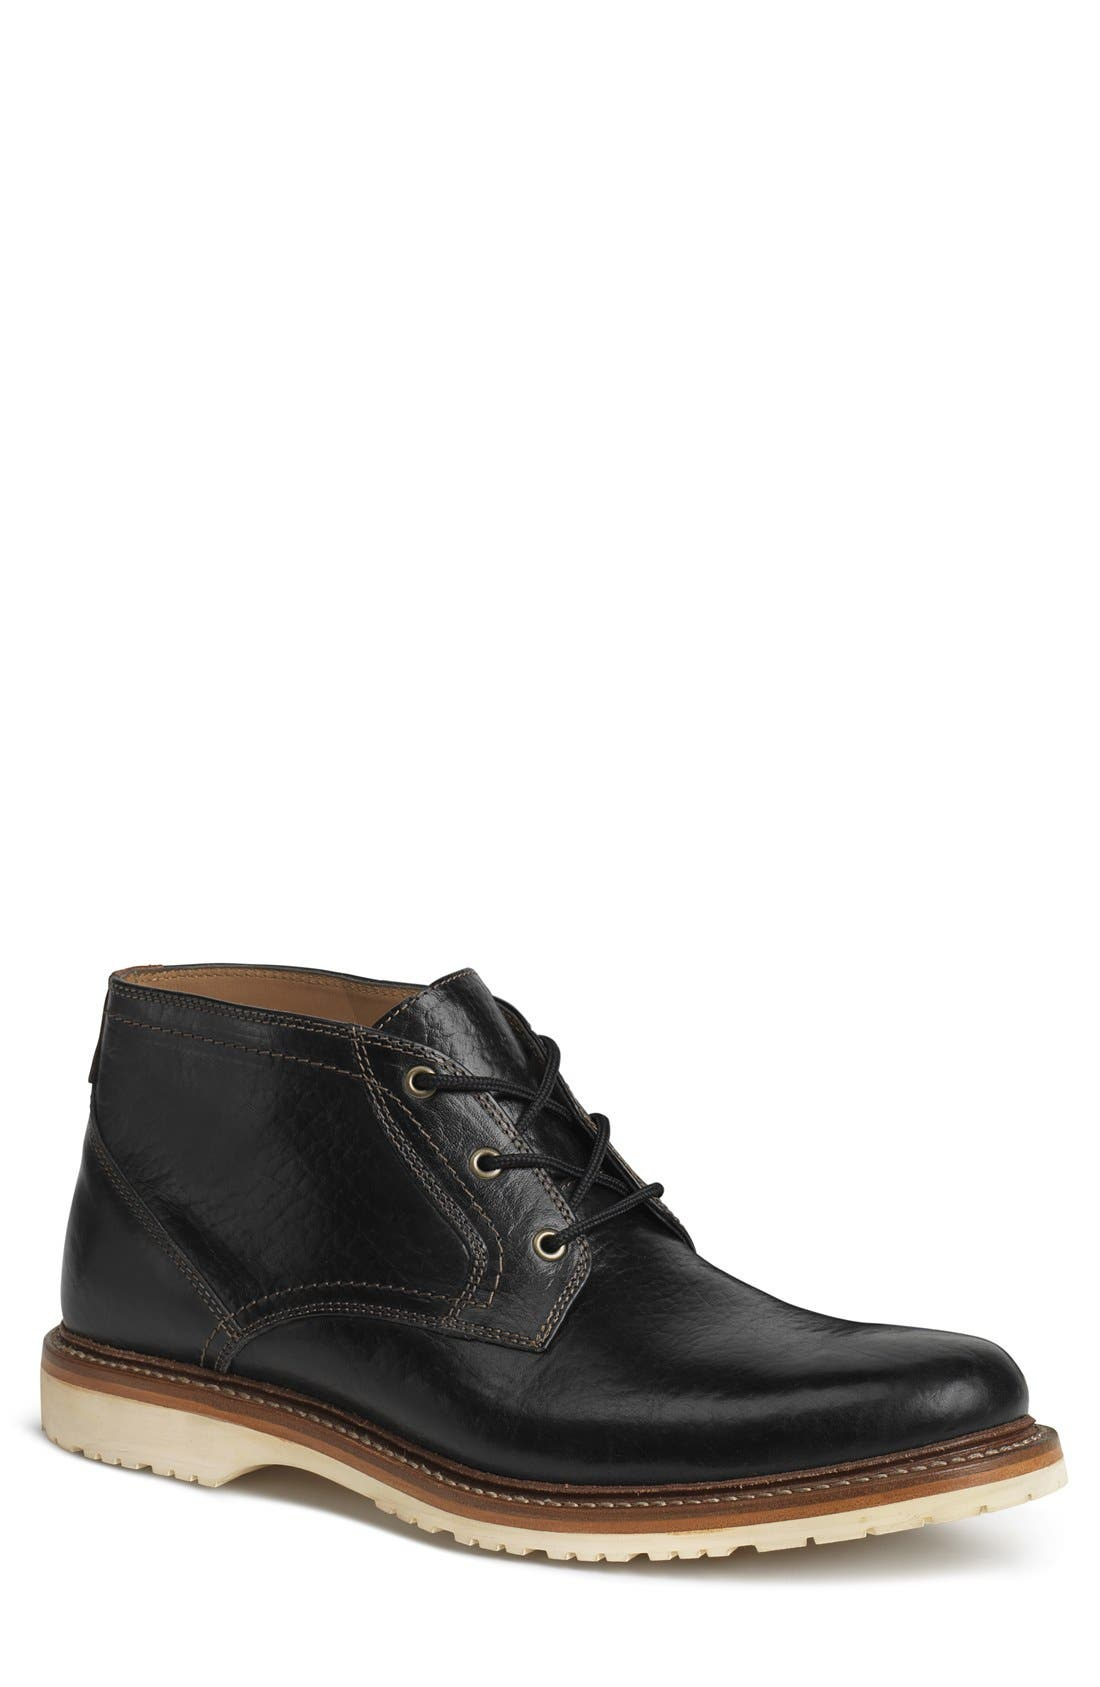 Trask Arlington Chukka Boot (Men)